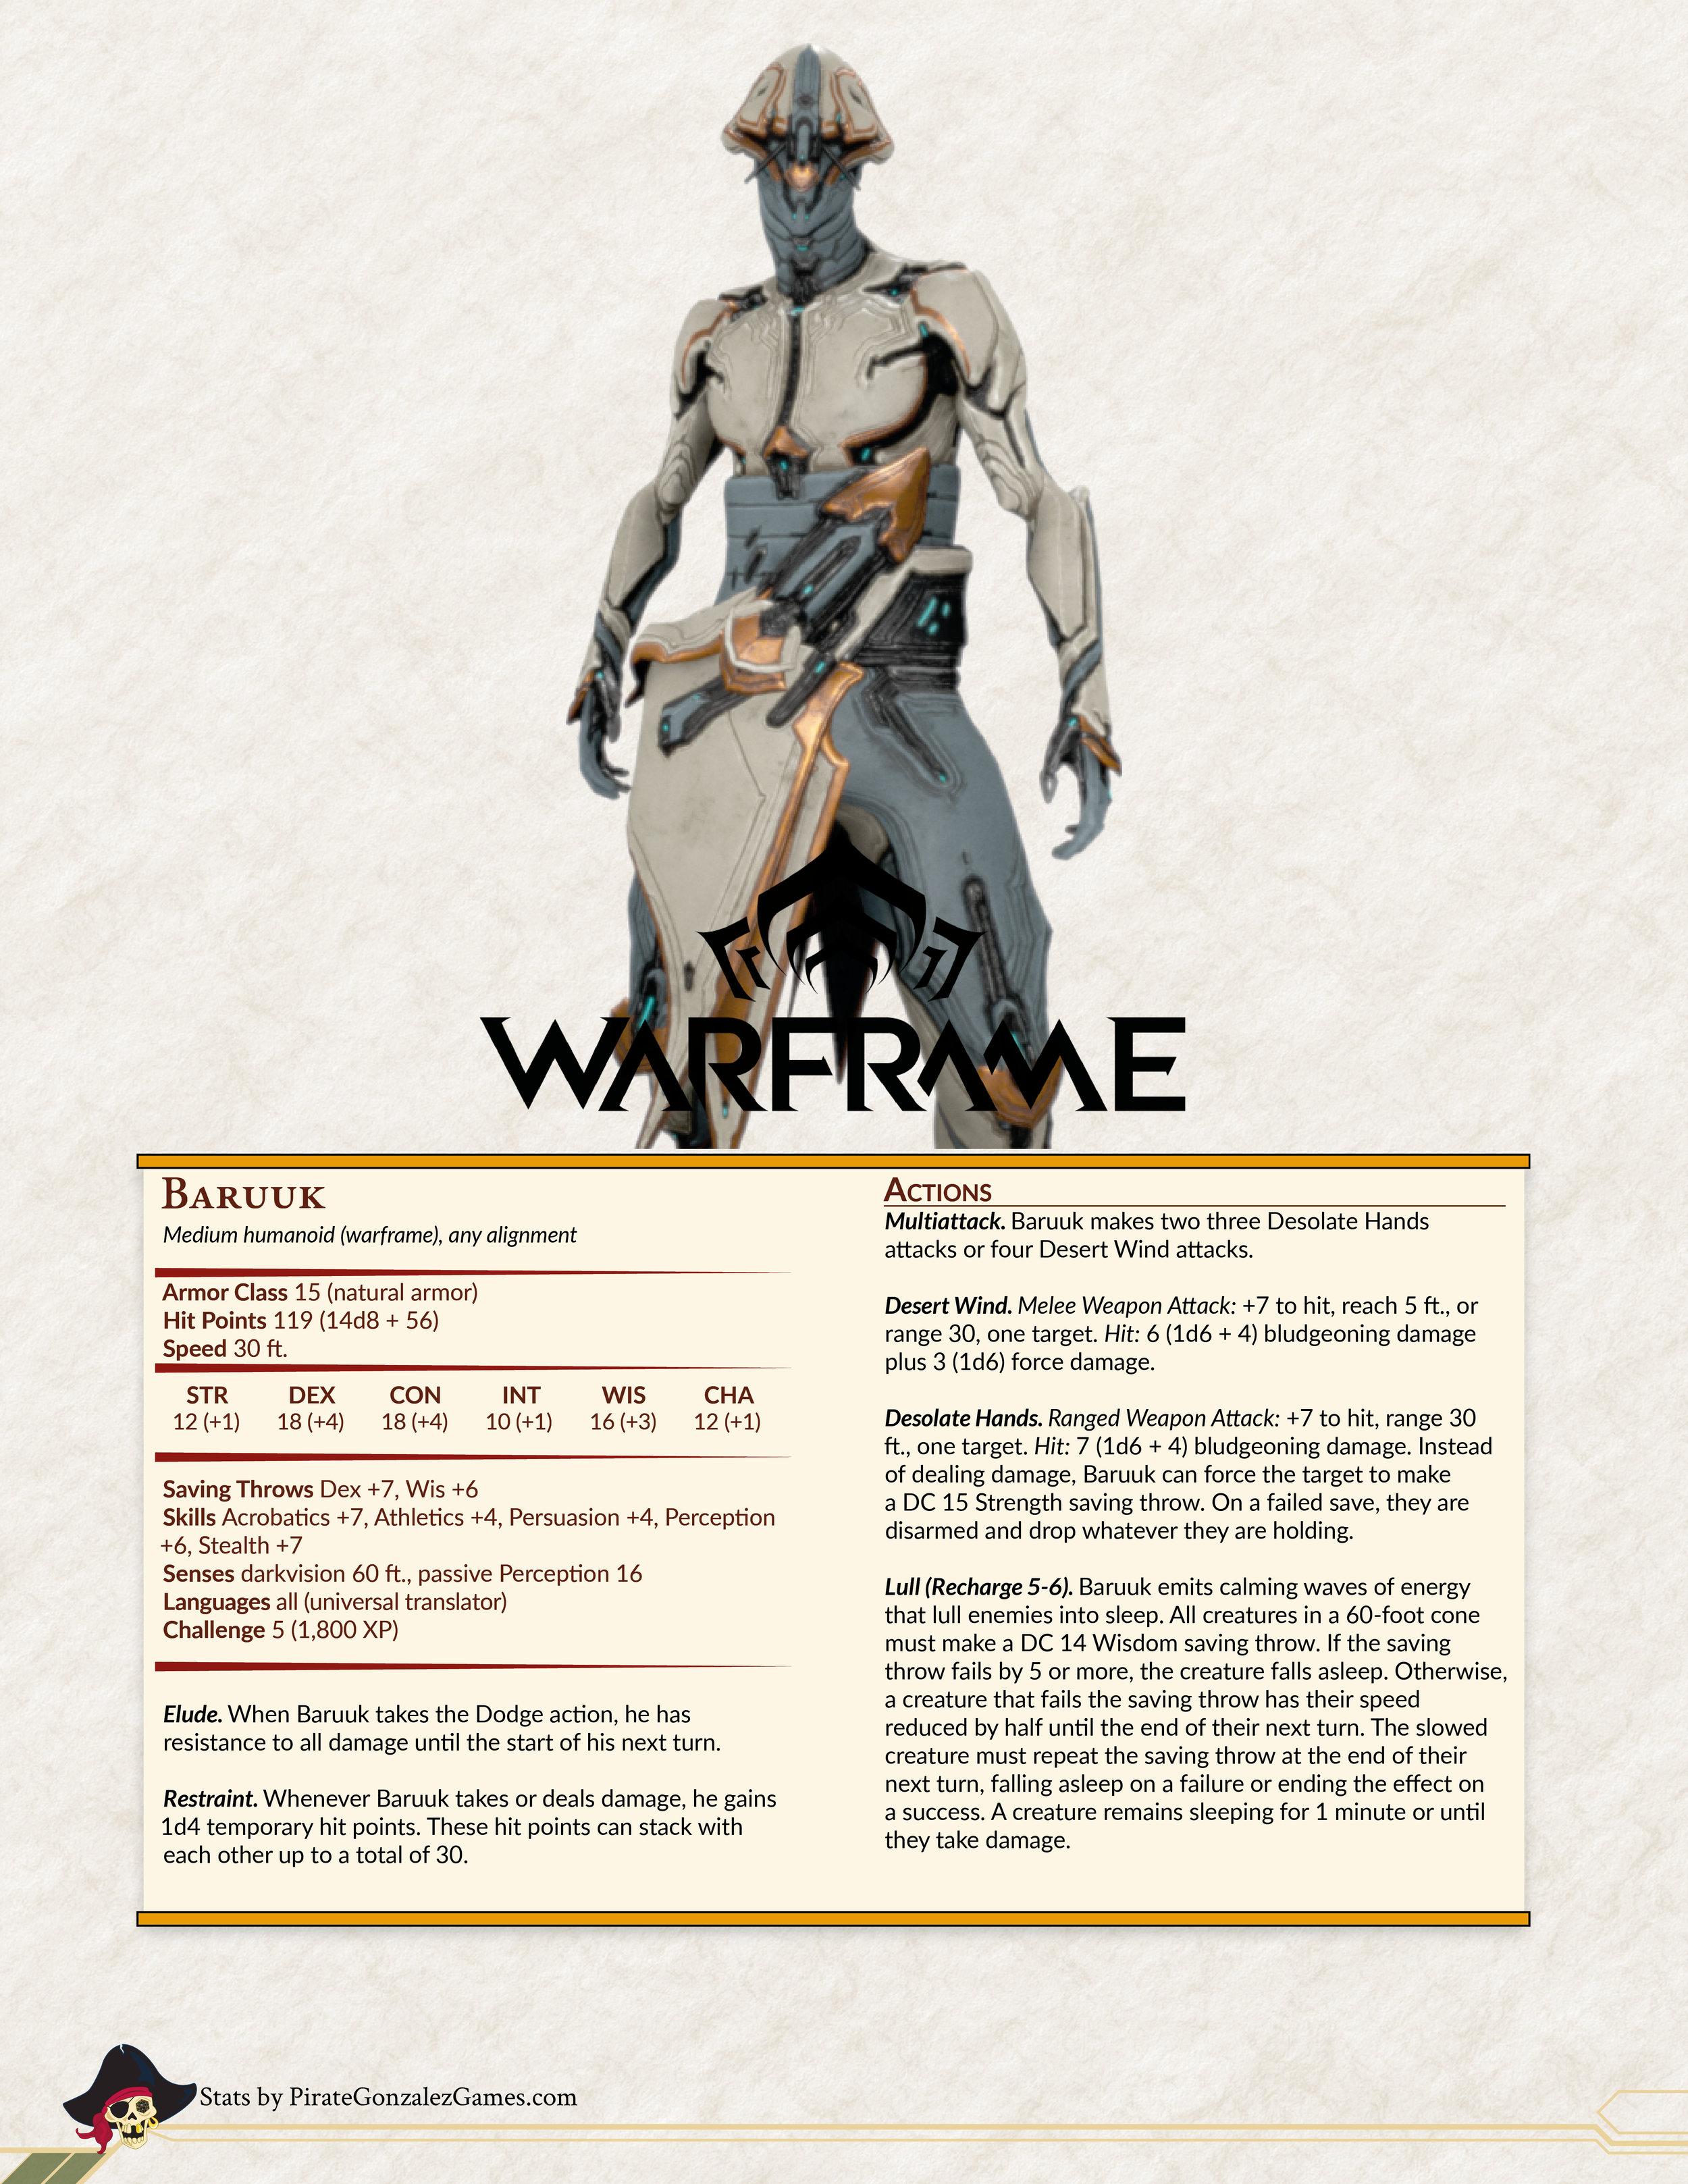 warframe4.jpg